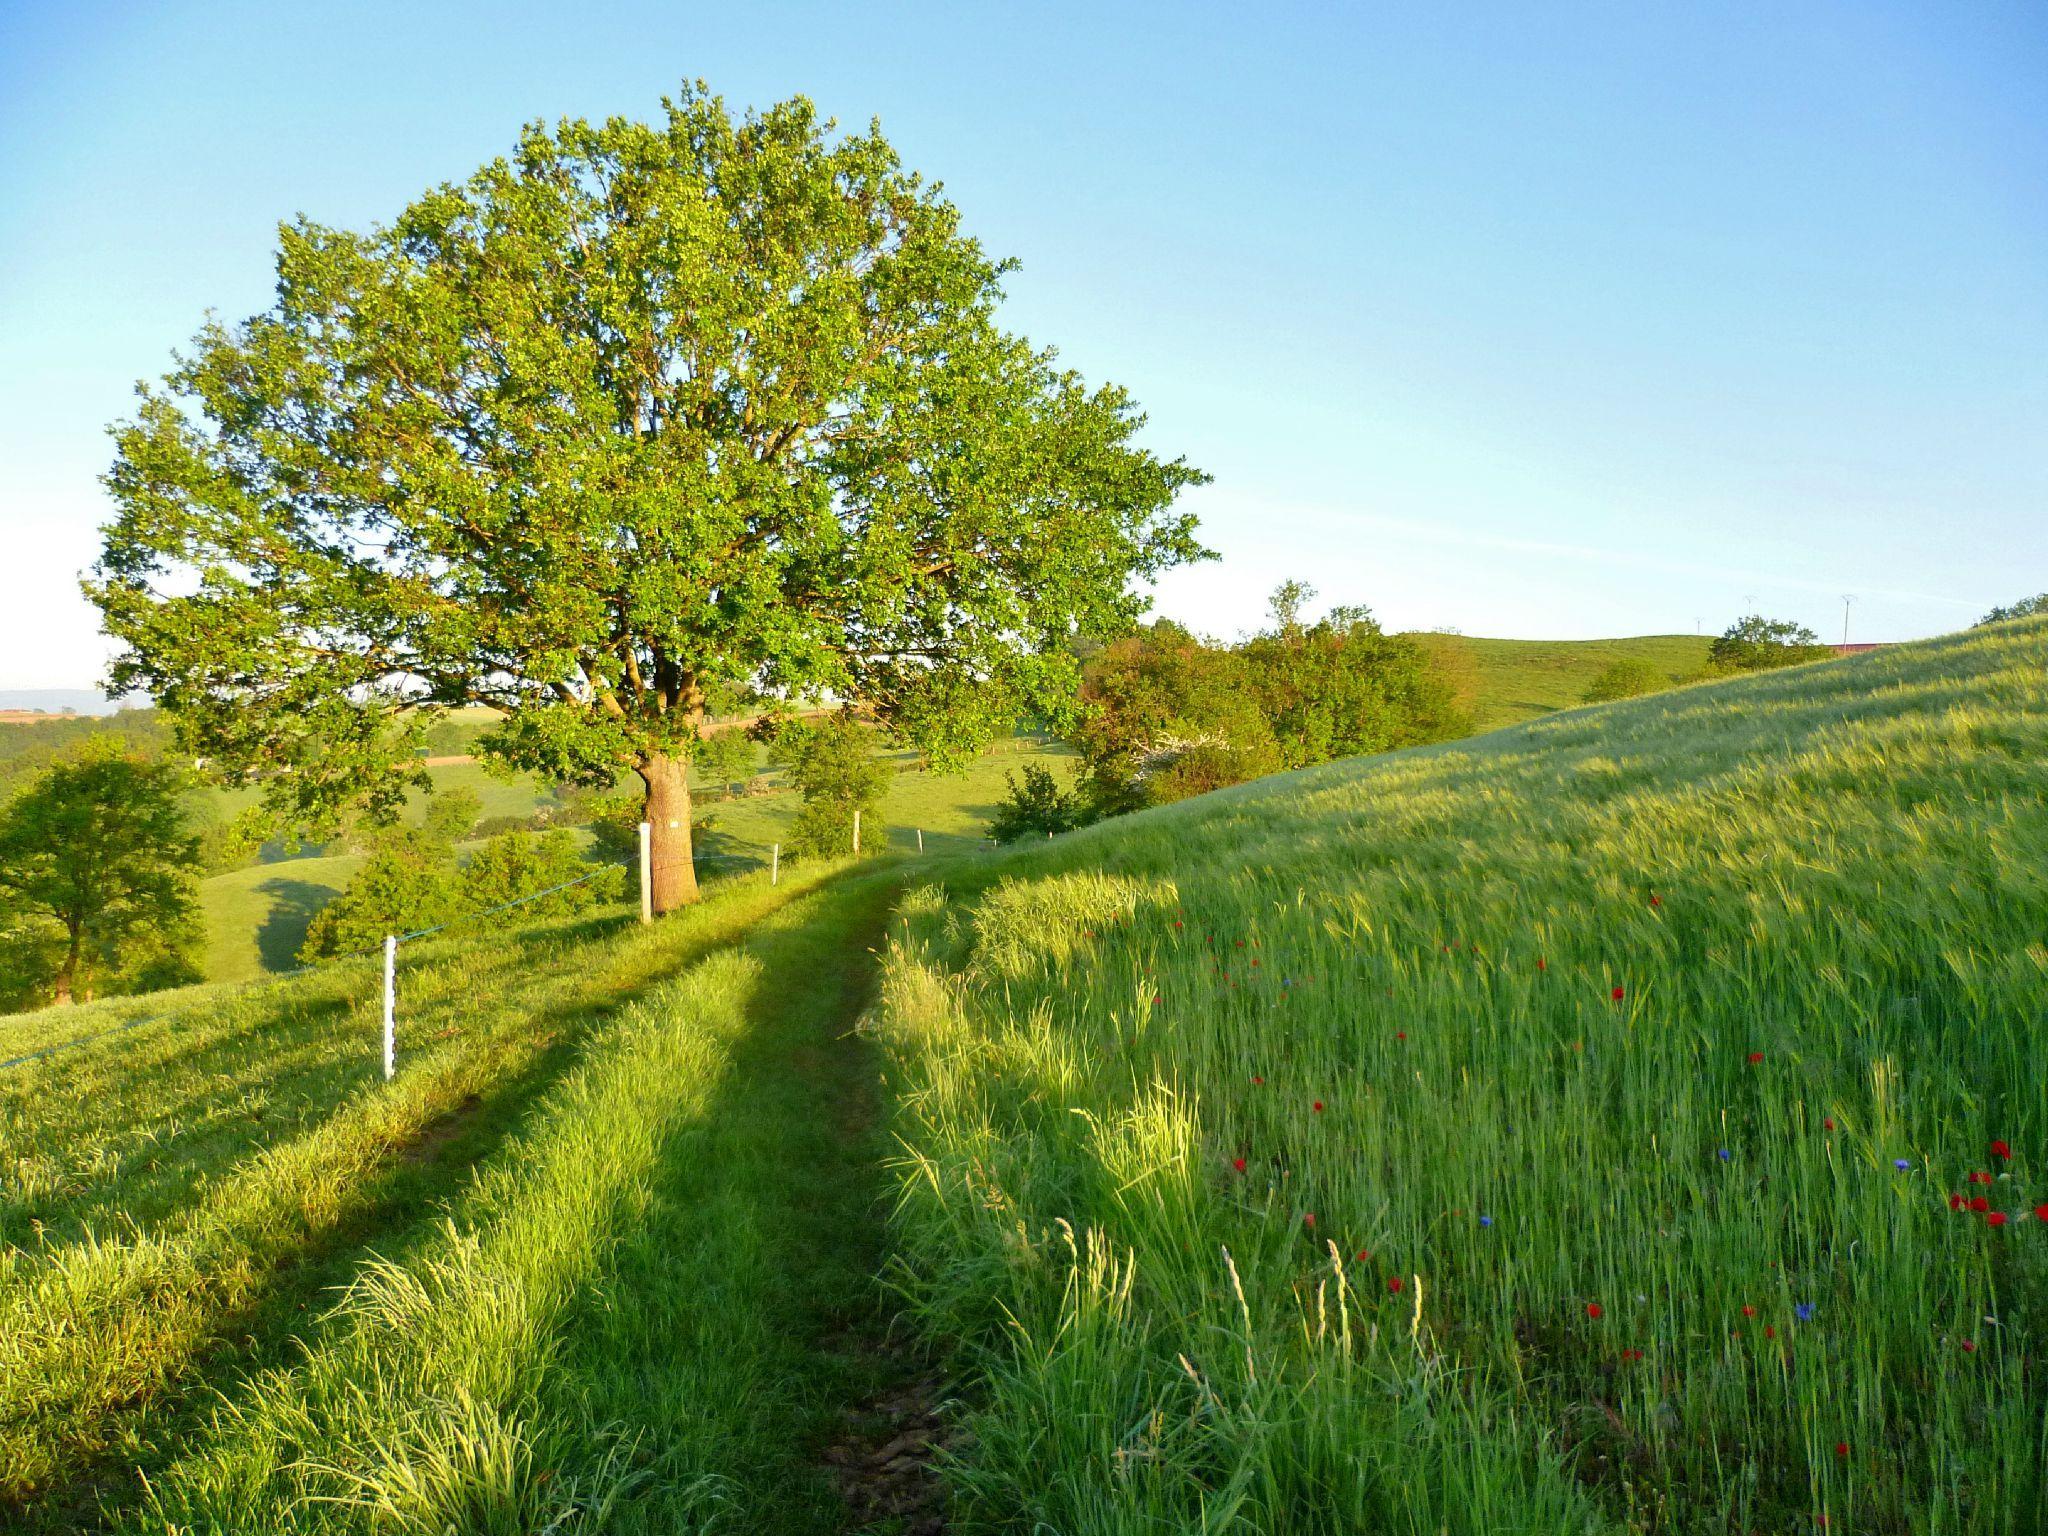 Walk through fields Promenade à travers les champs